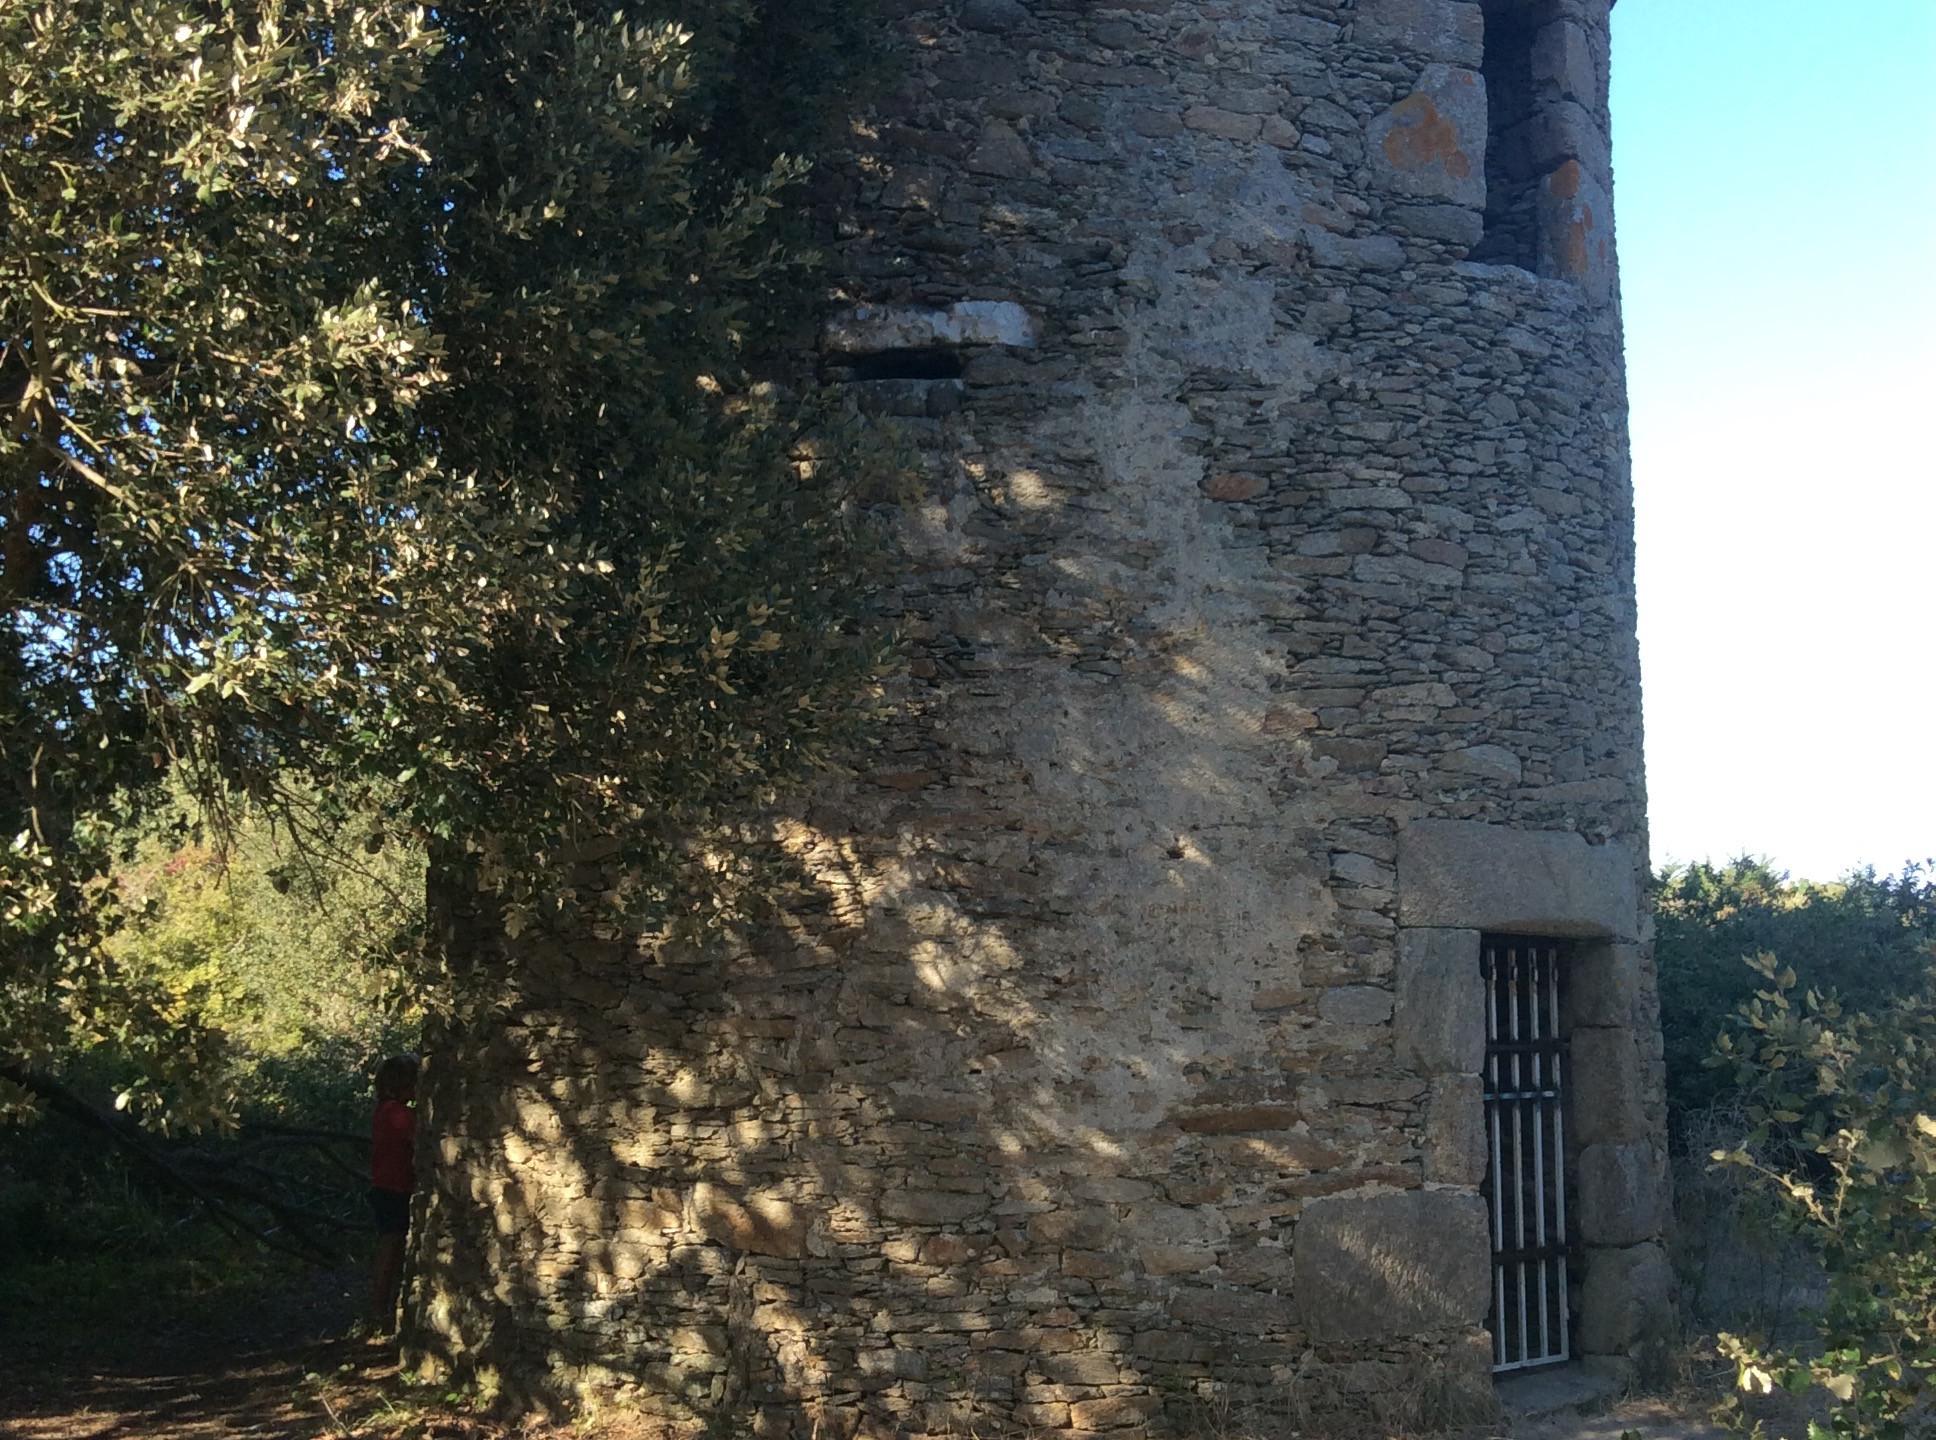 Moulin du Grand Chemin